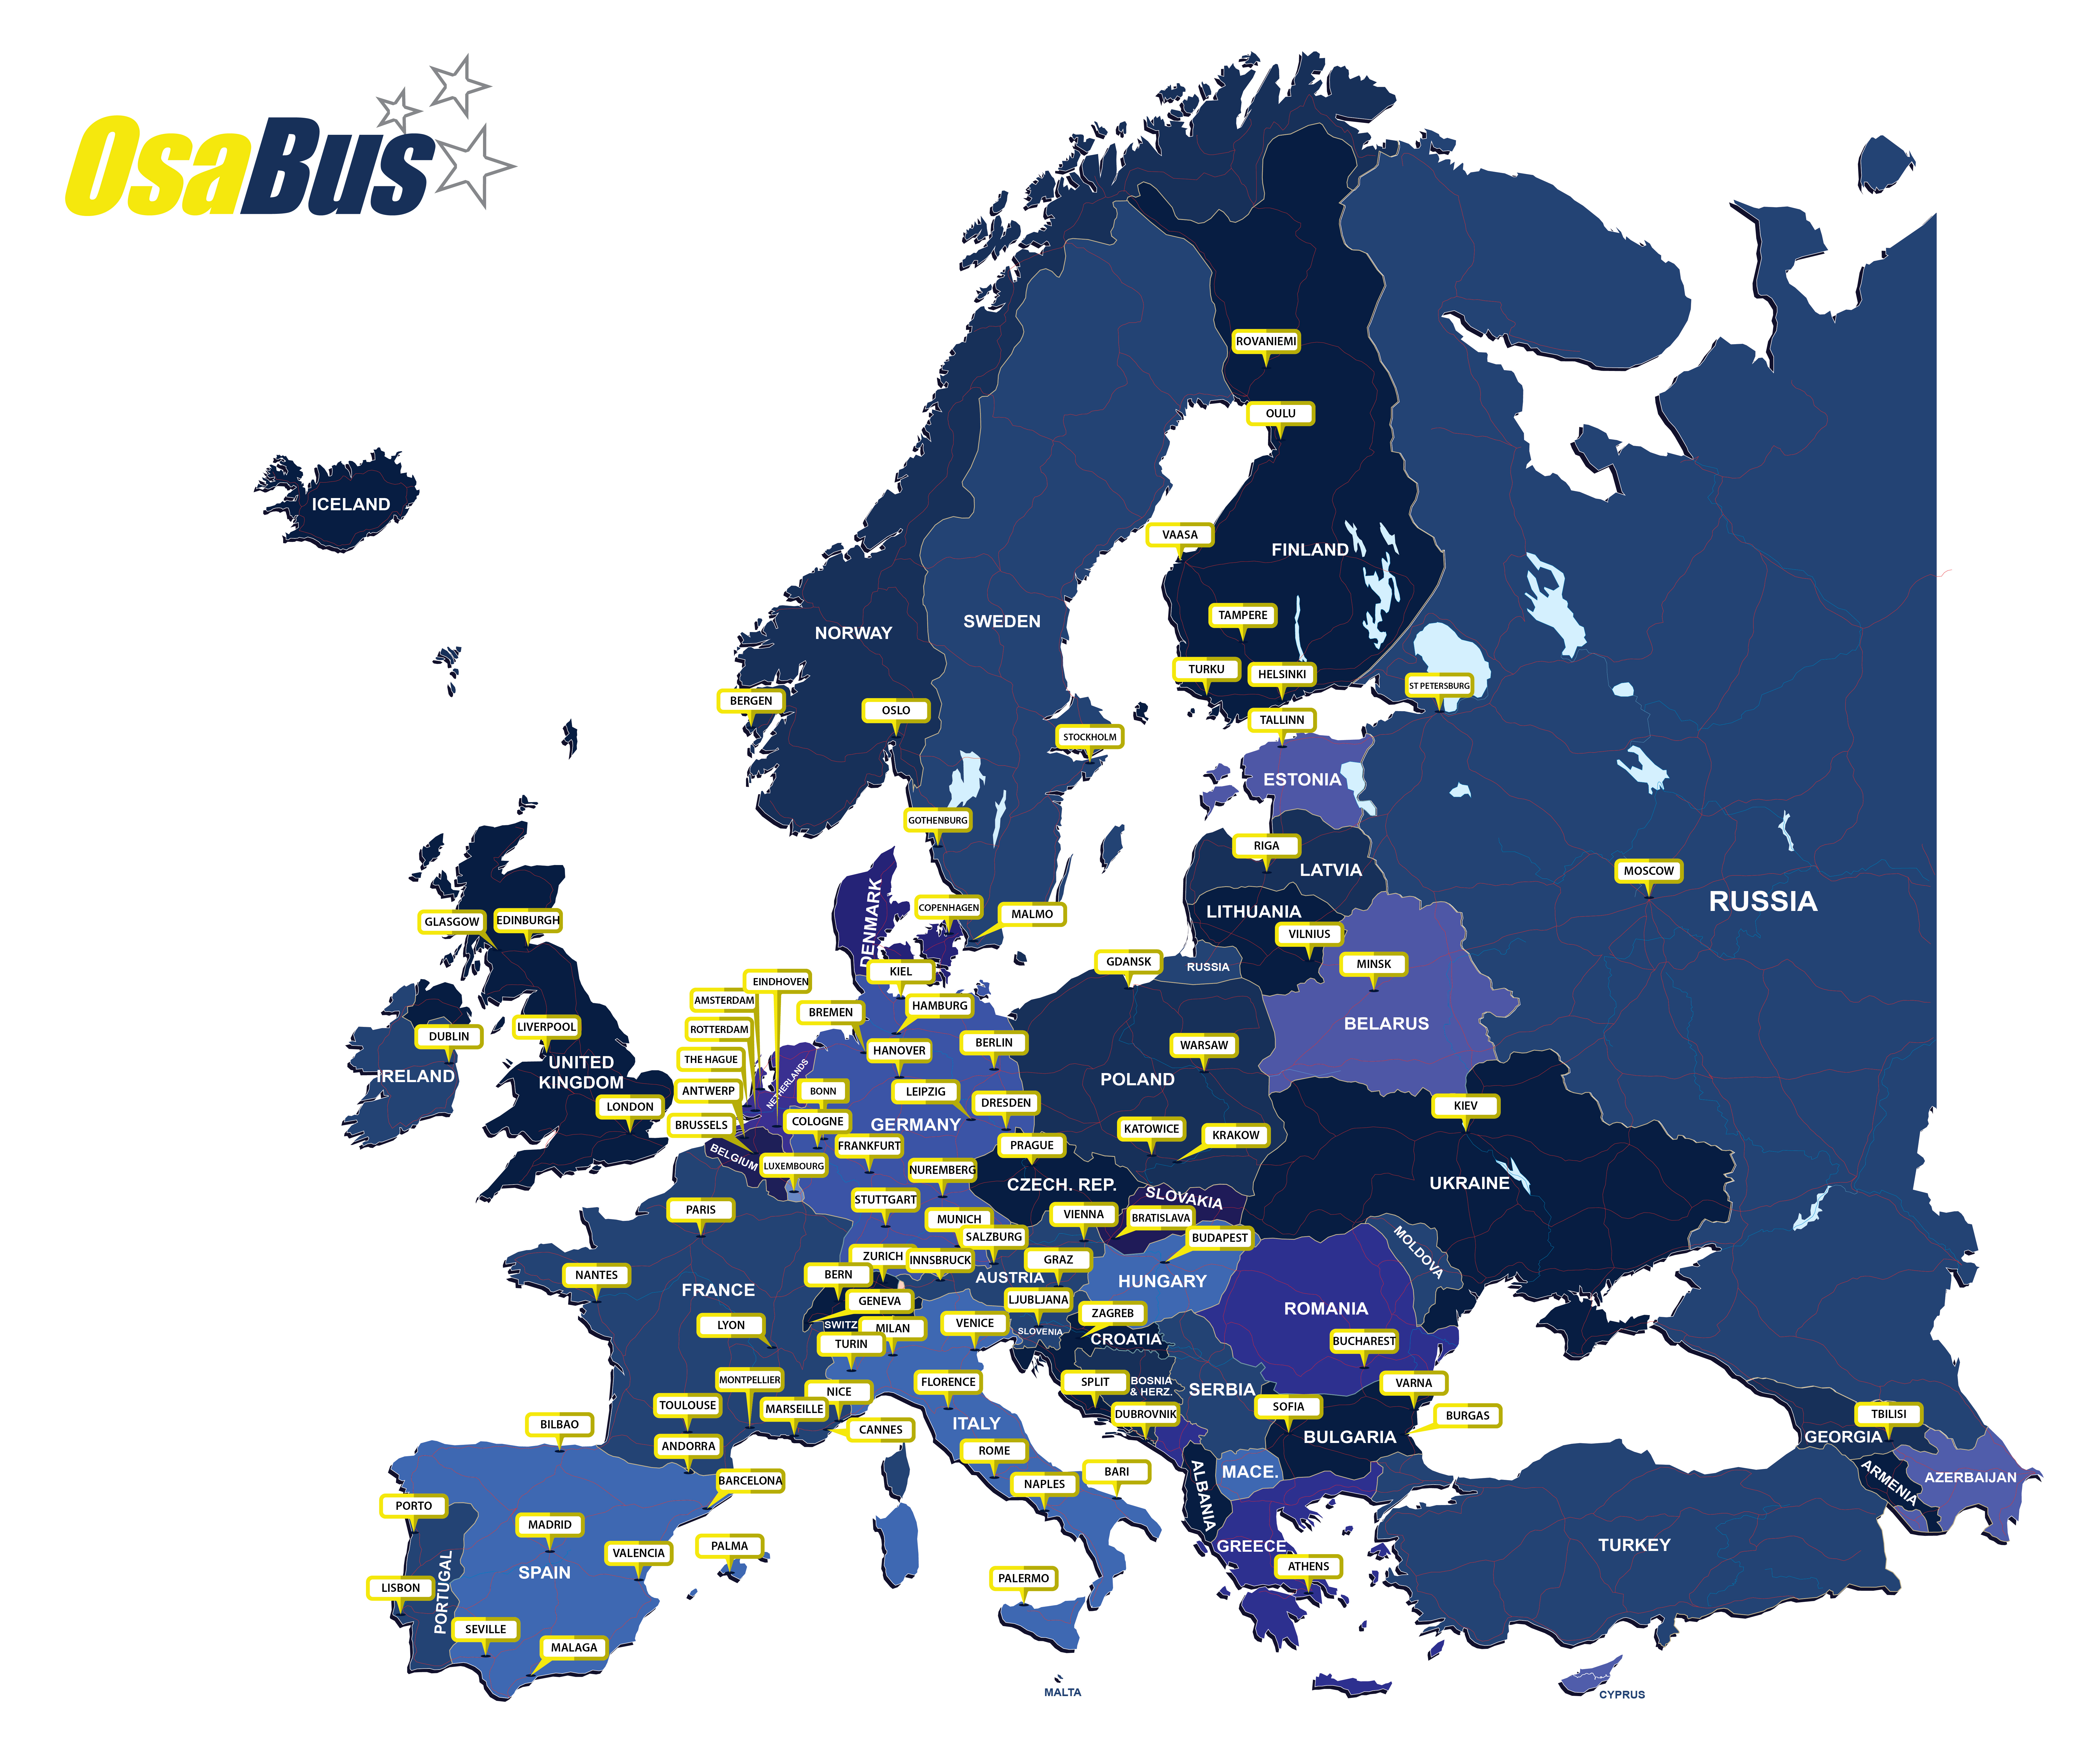 OsaBus company service locations